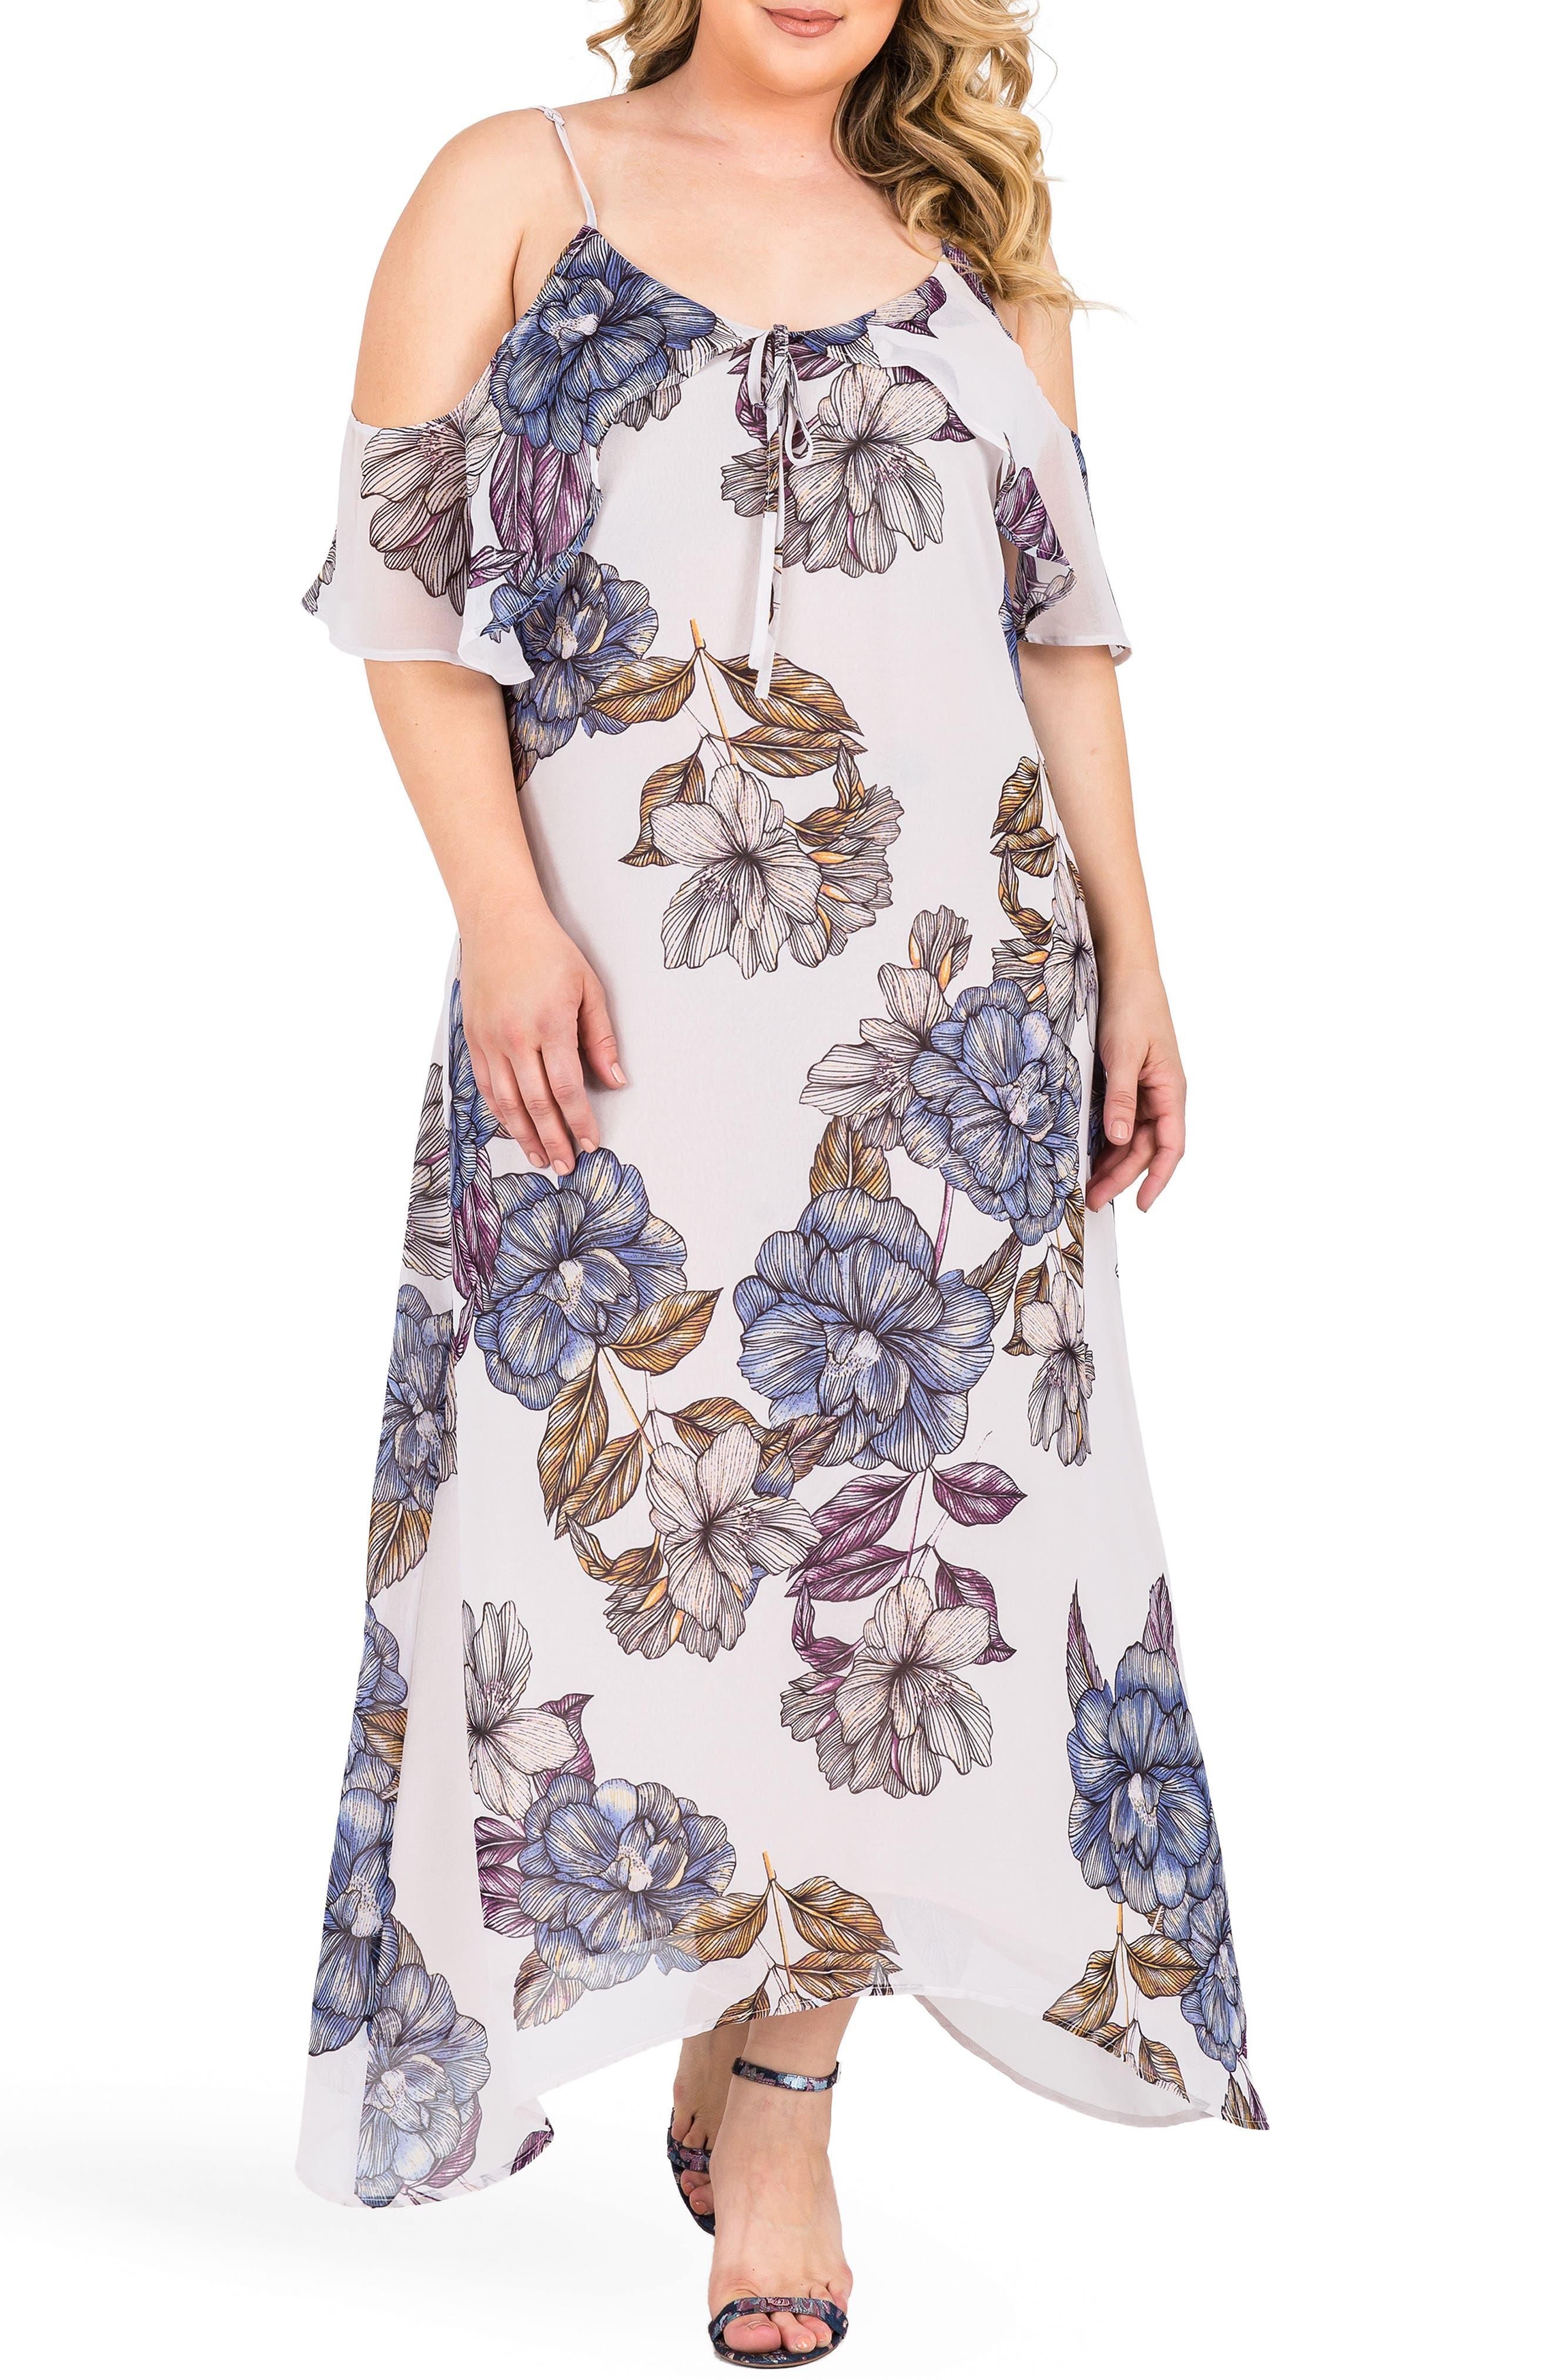 Matilda Floral Cold Shoulder Maxi Dress,                             Main thumbnail 1, color,                             LIGHT GRAY FLORAL PRINT